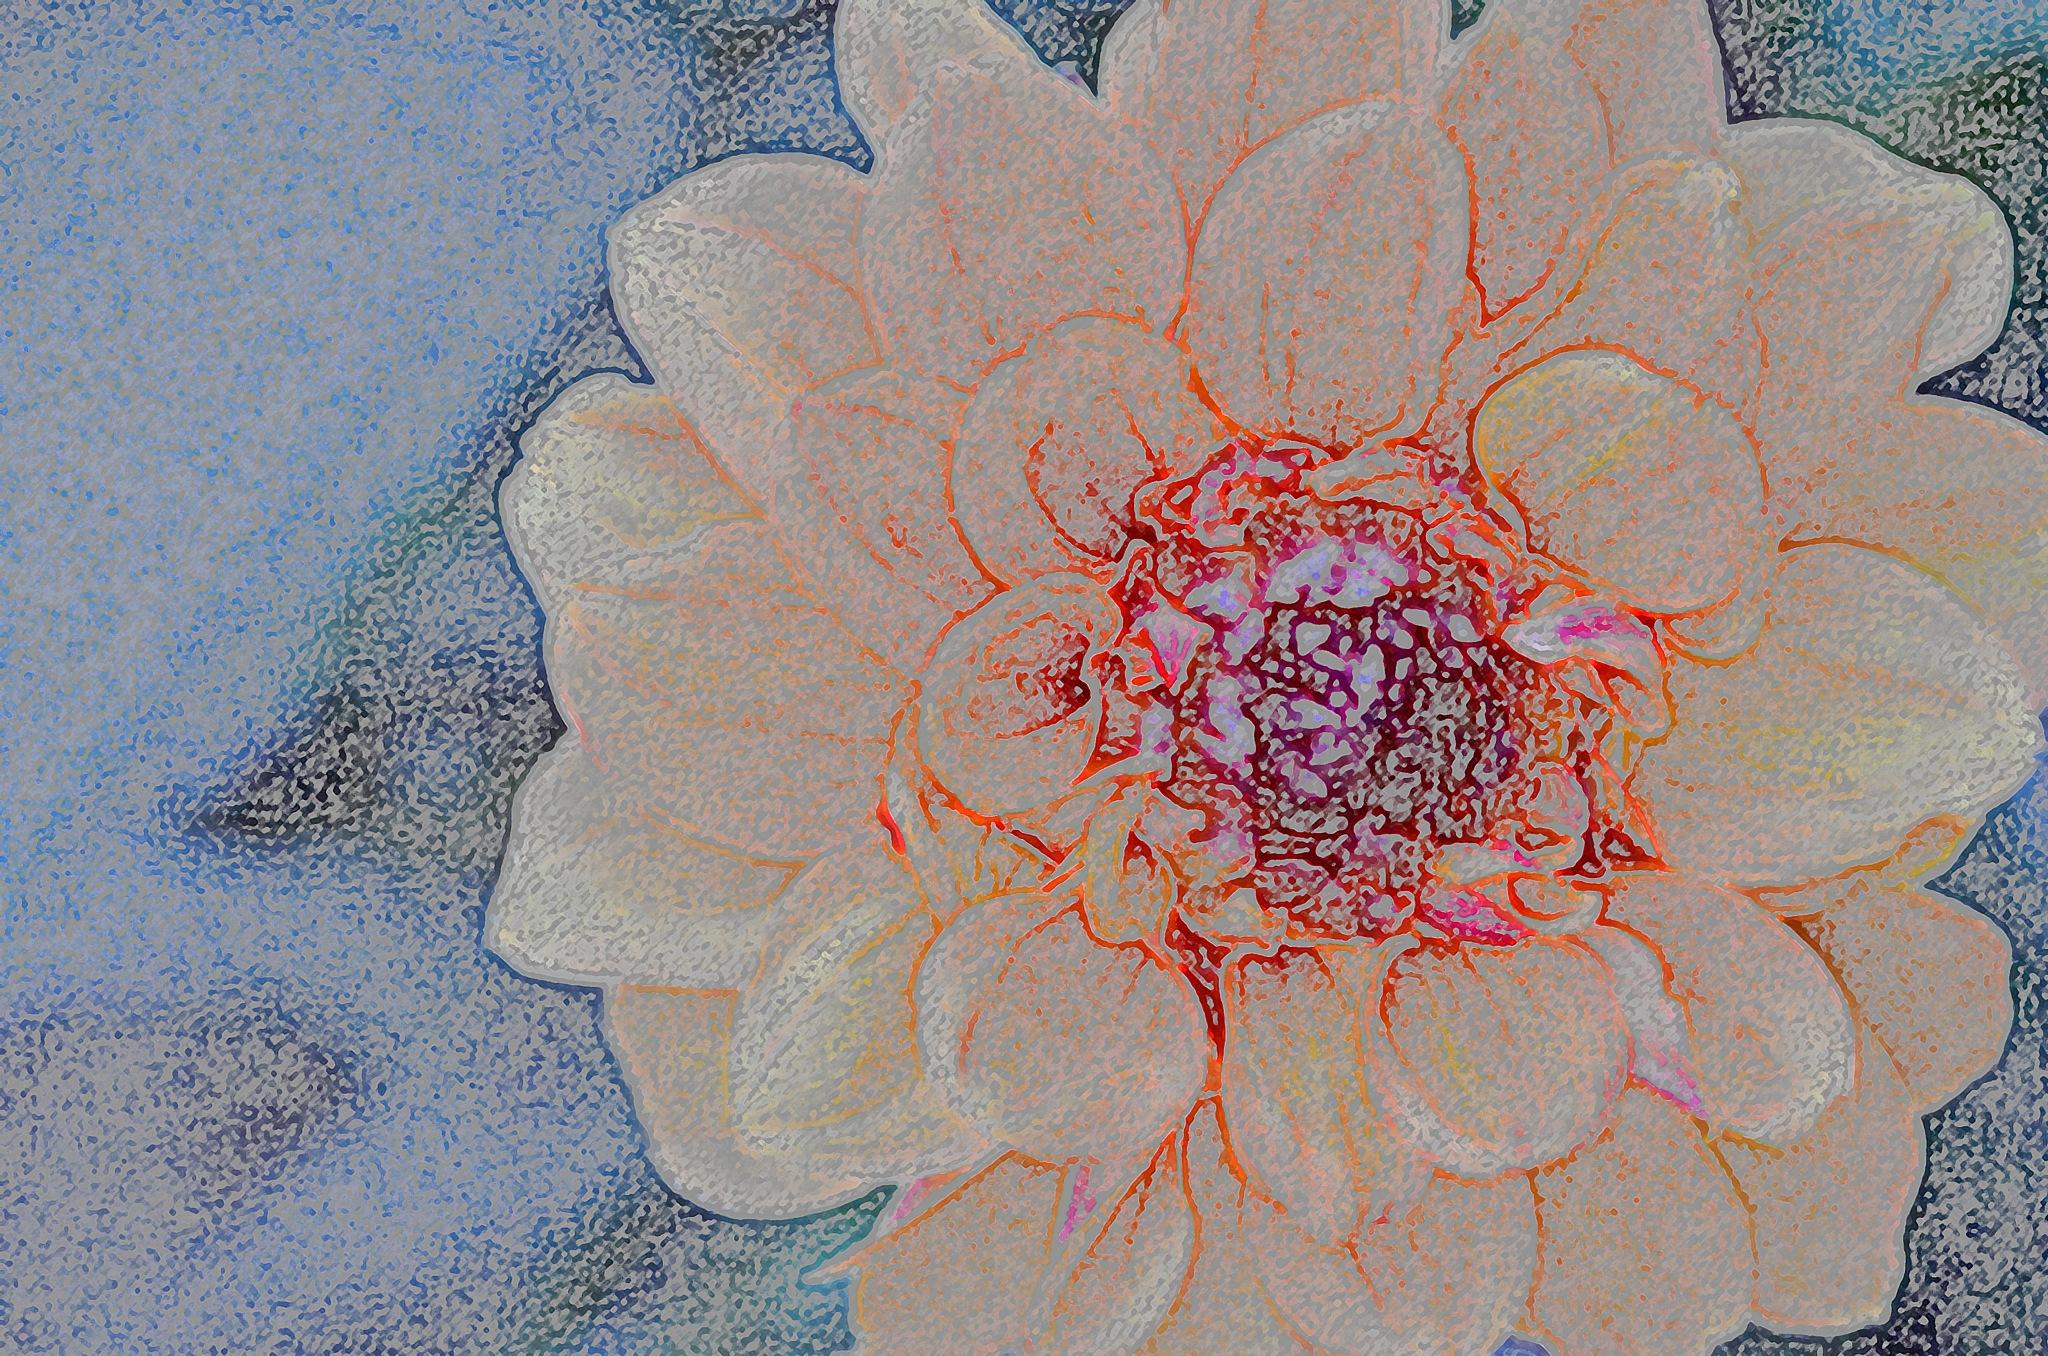 Dahlia Glory by Debby Pueschel